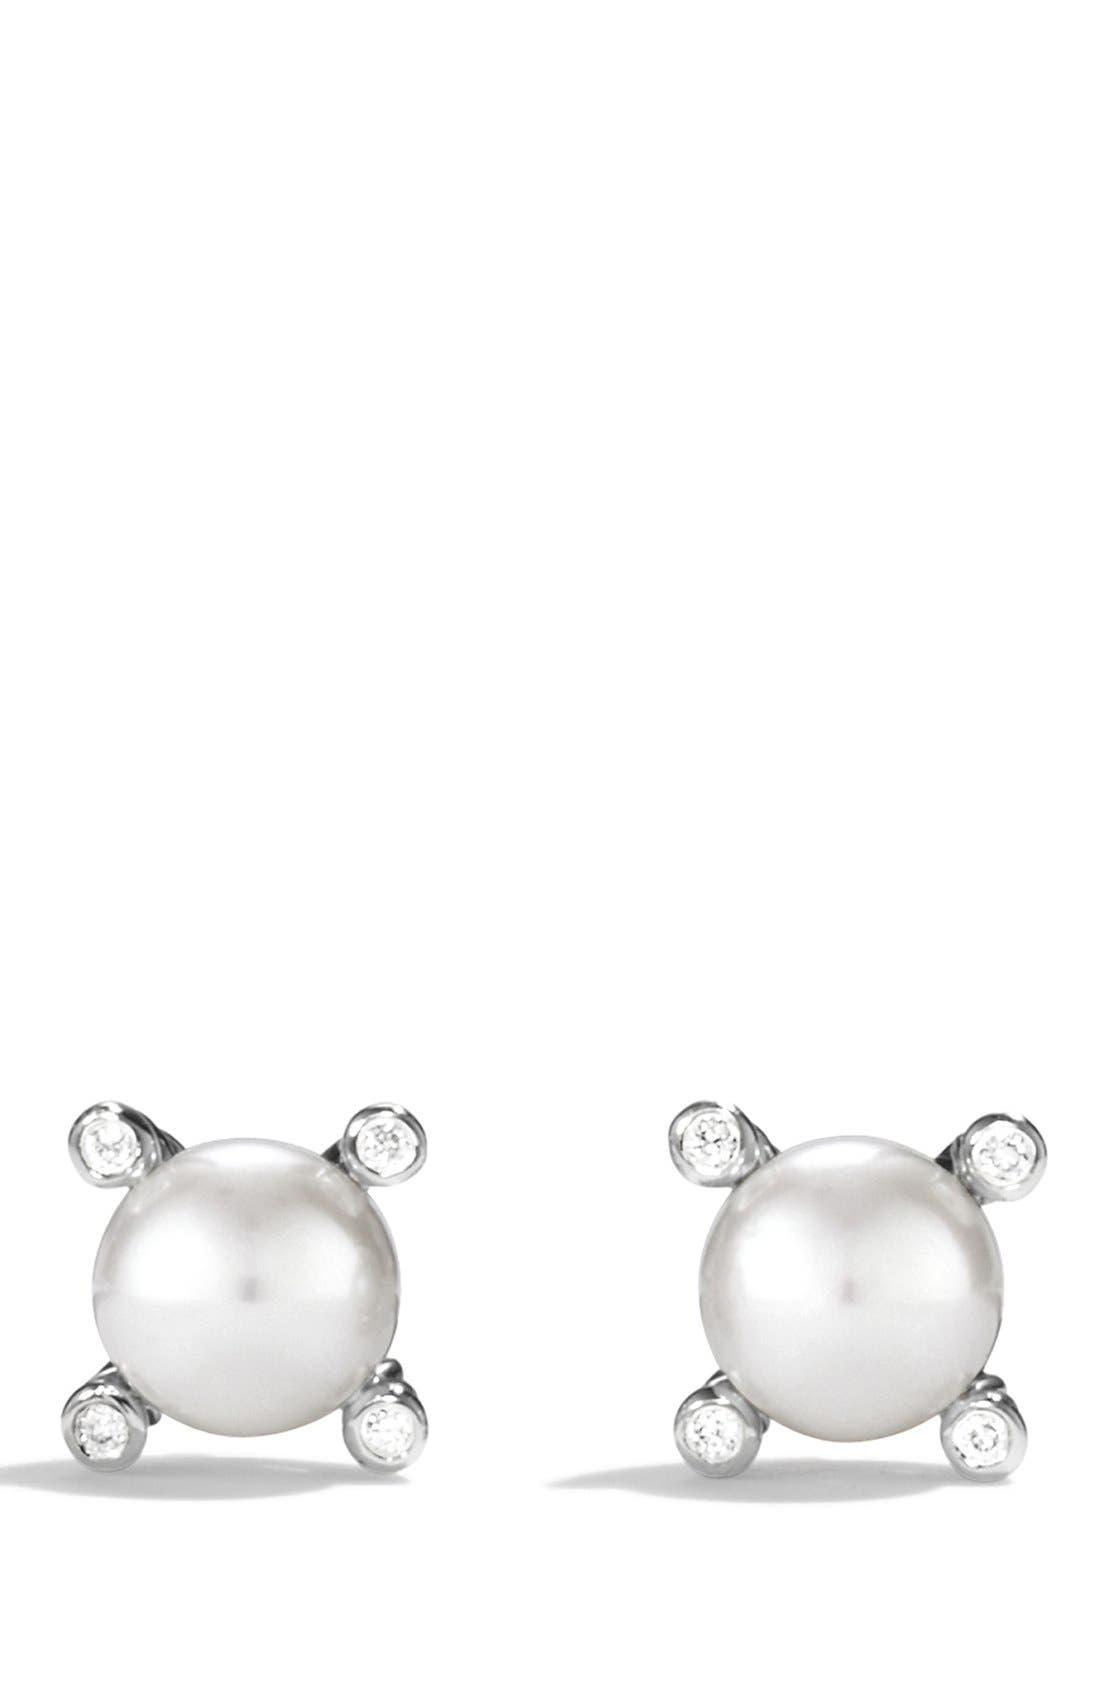 Main Image - David Yurman Small Pearl Earrings with Diamonds